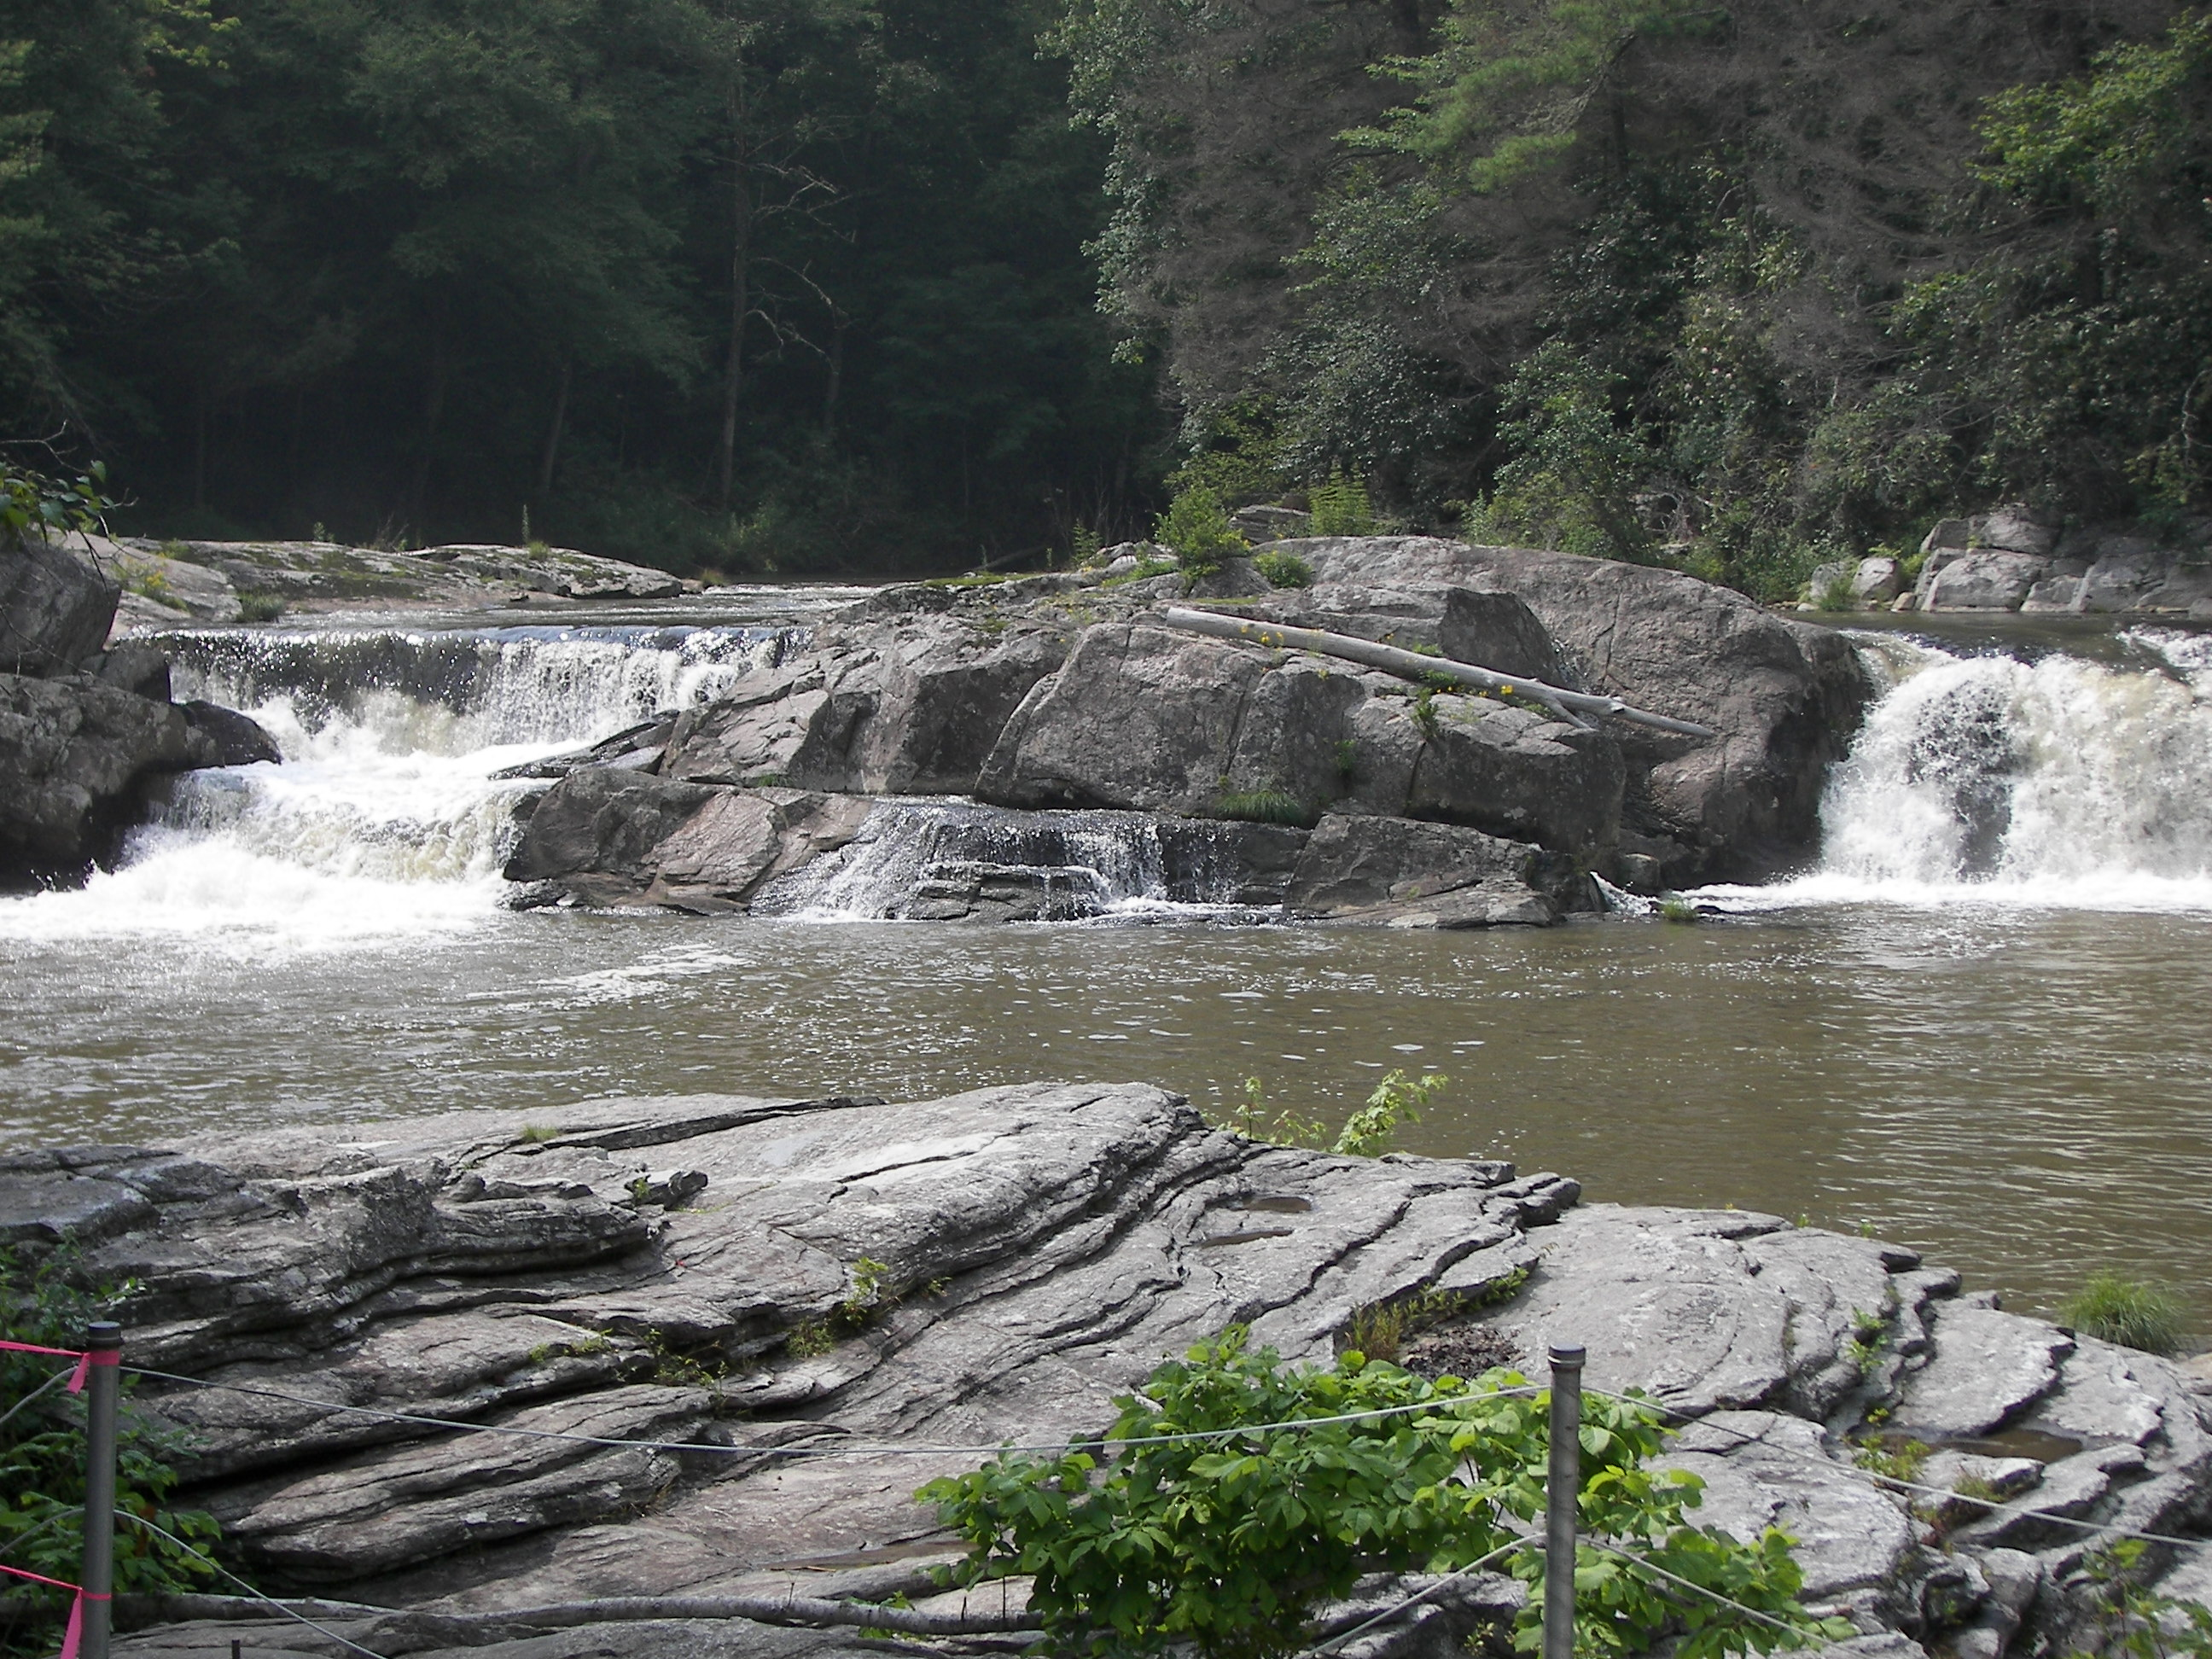 Rock Creek 2 by seiyastock